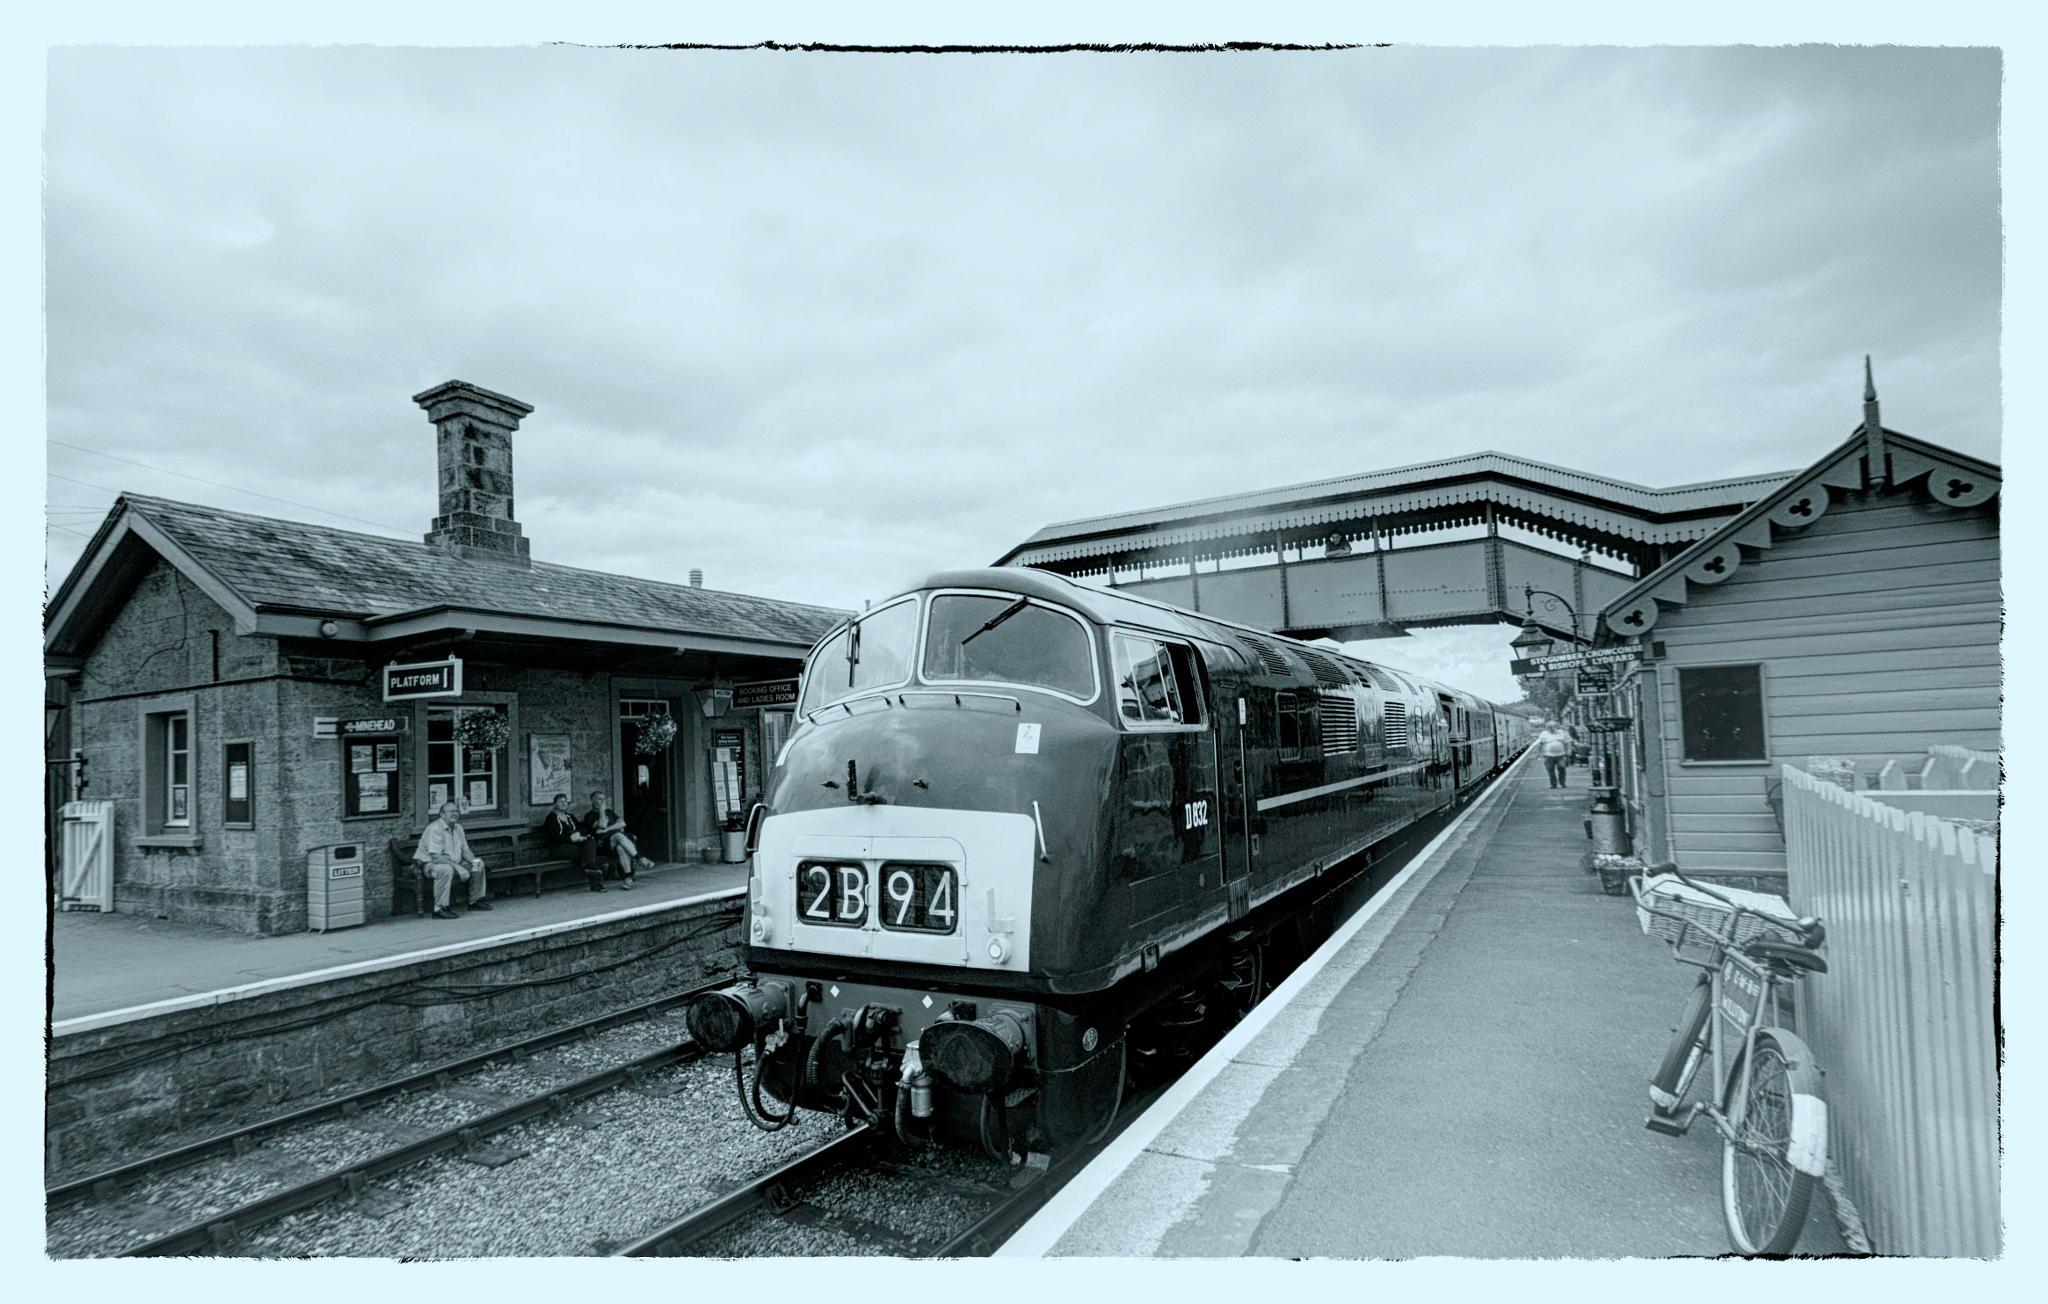 2B94 departing by Tony Bridges